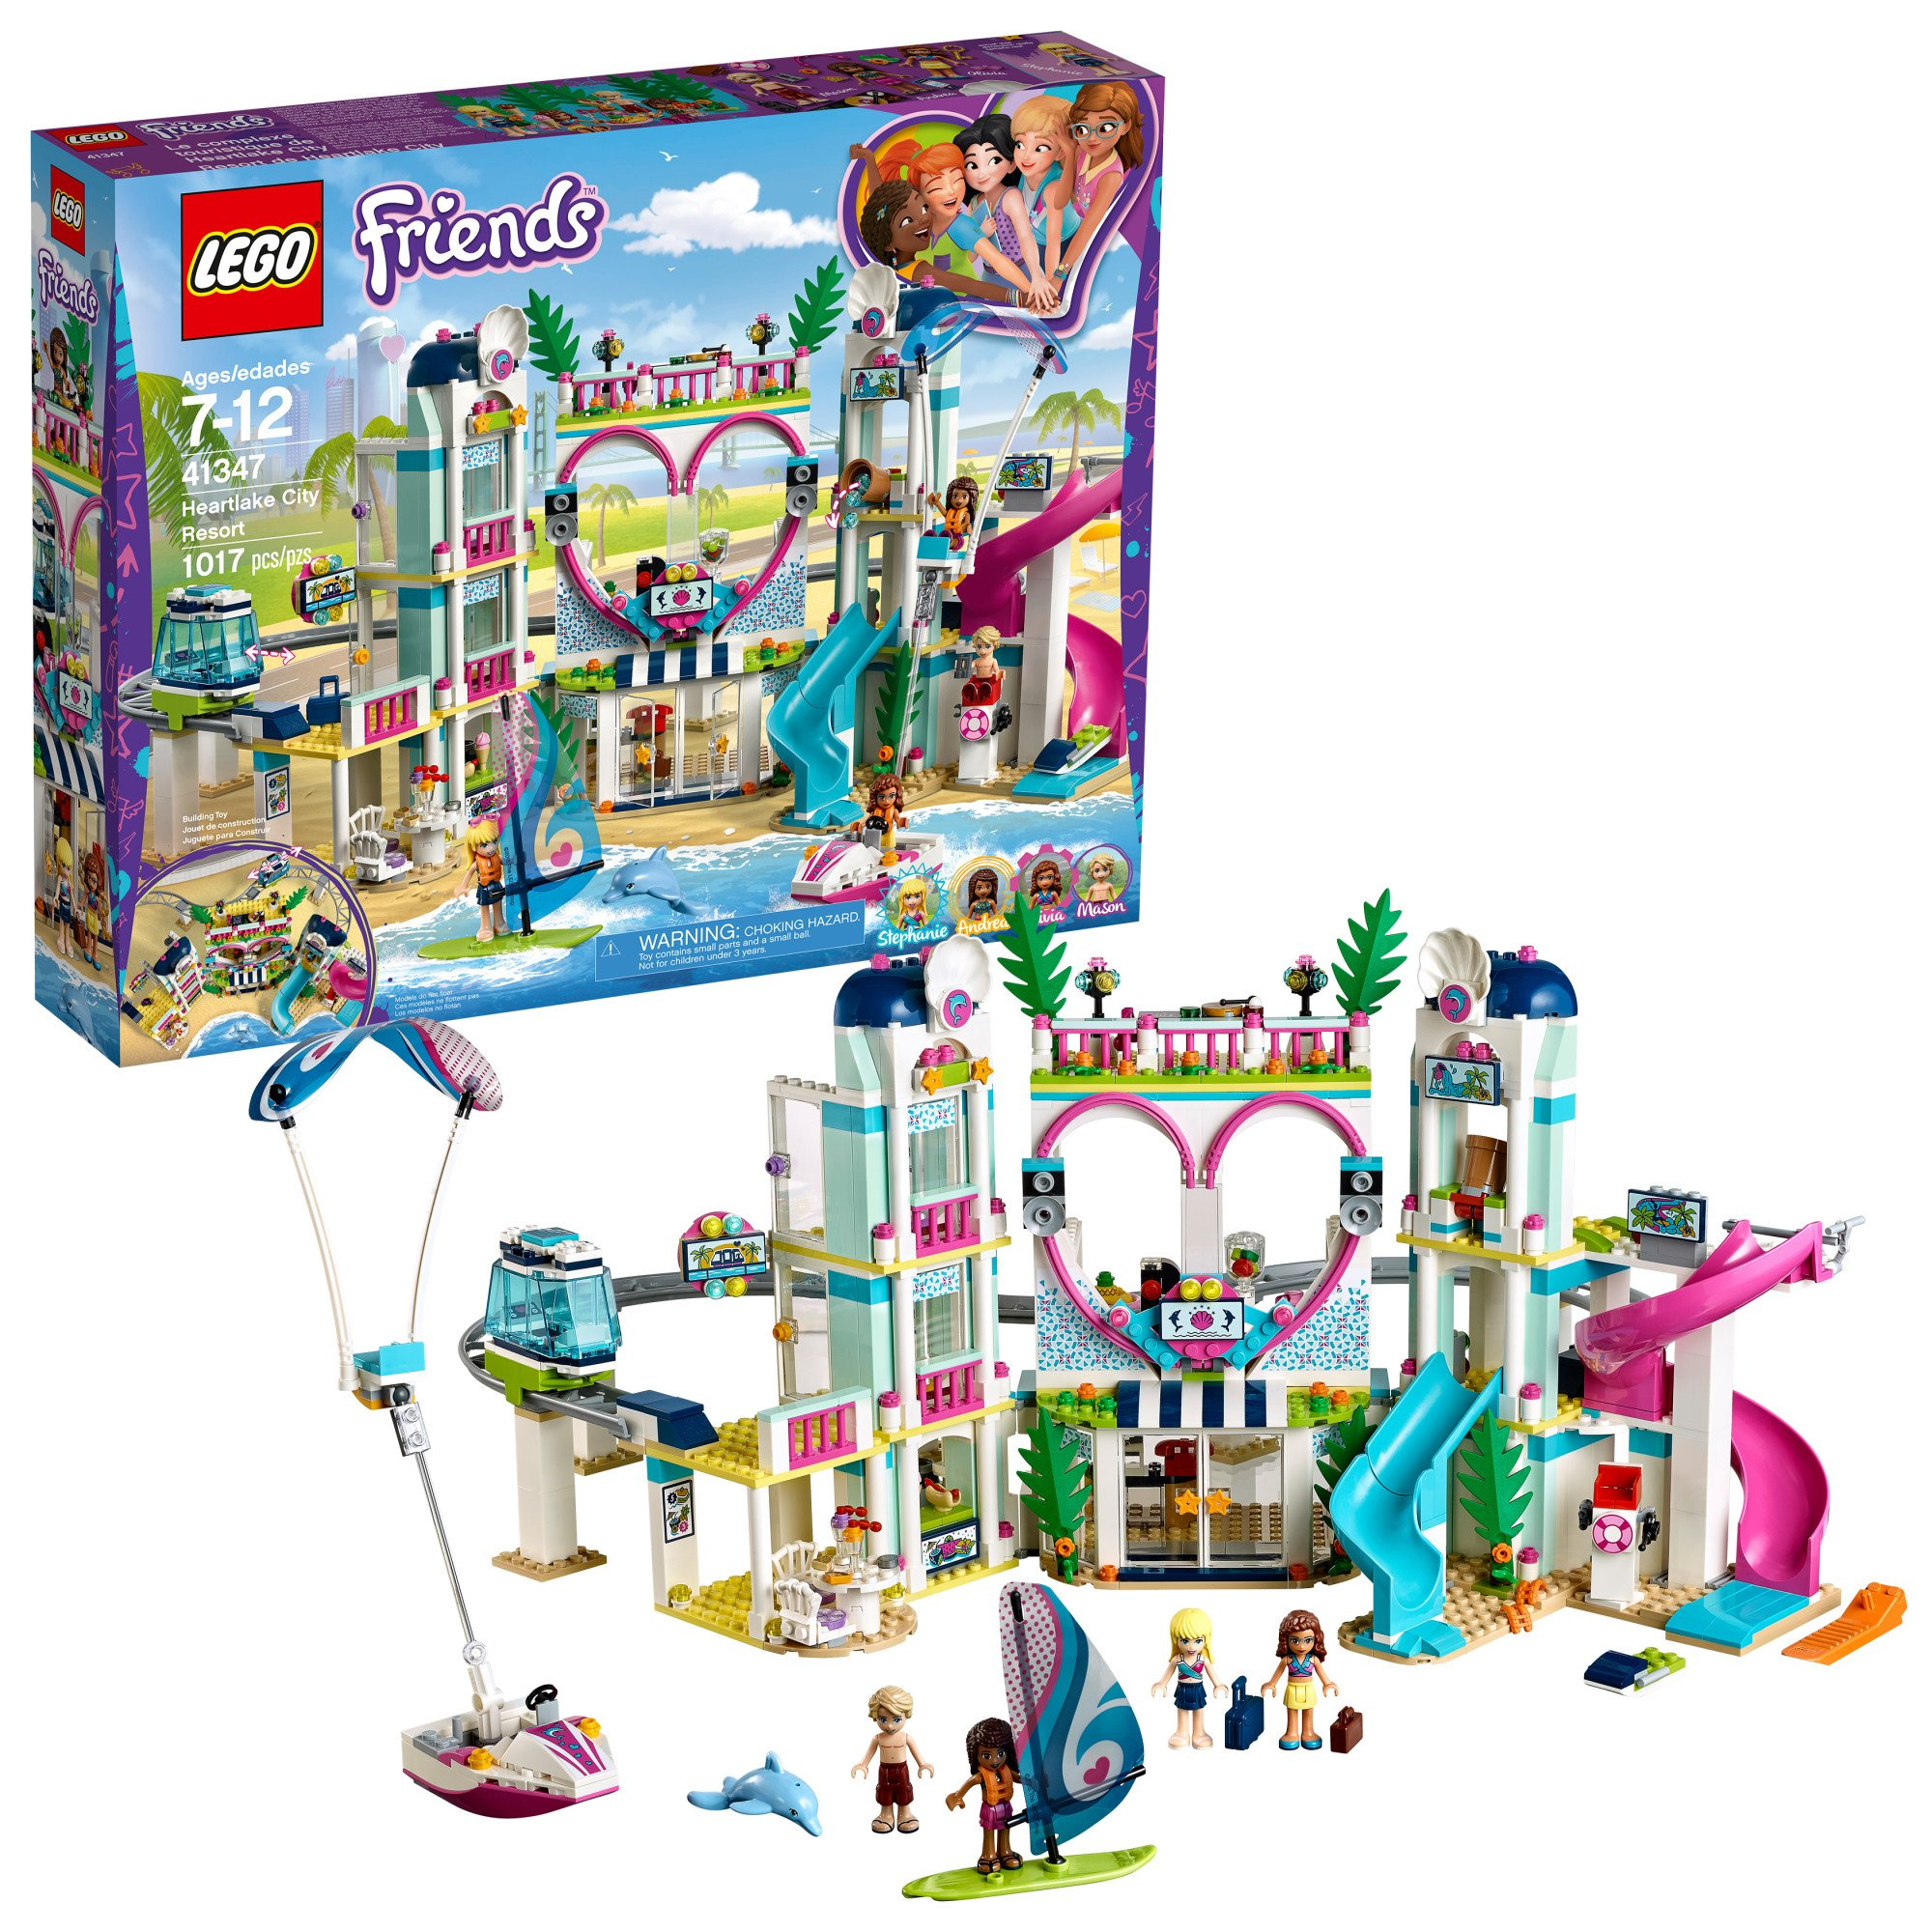 LEGO Friends Heartlake City Resort Building Kit (1017 Piece), Multicolor